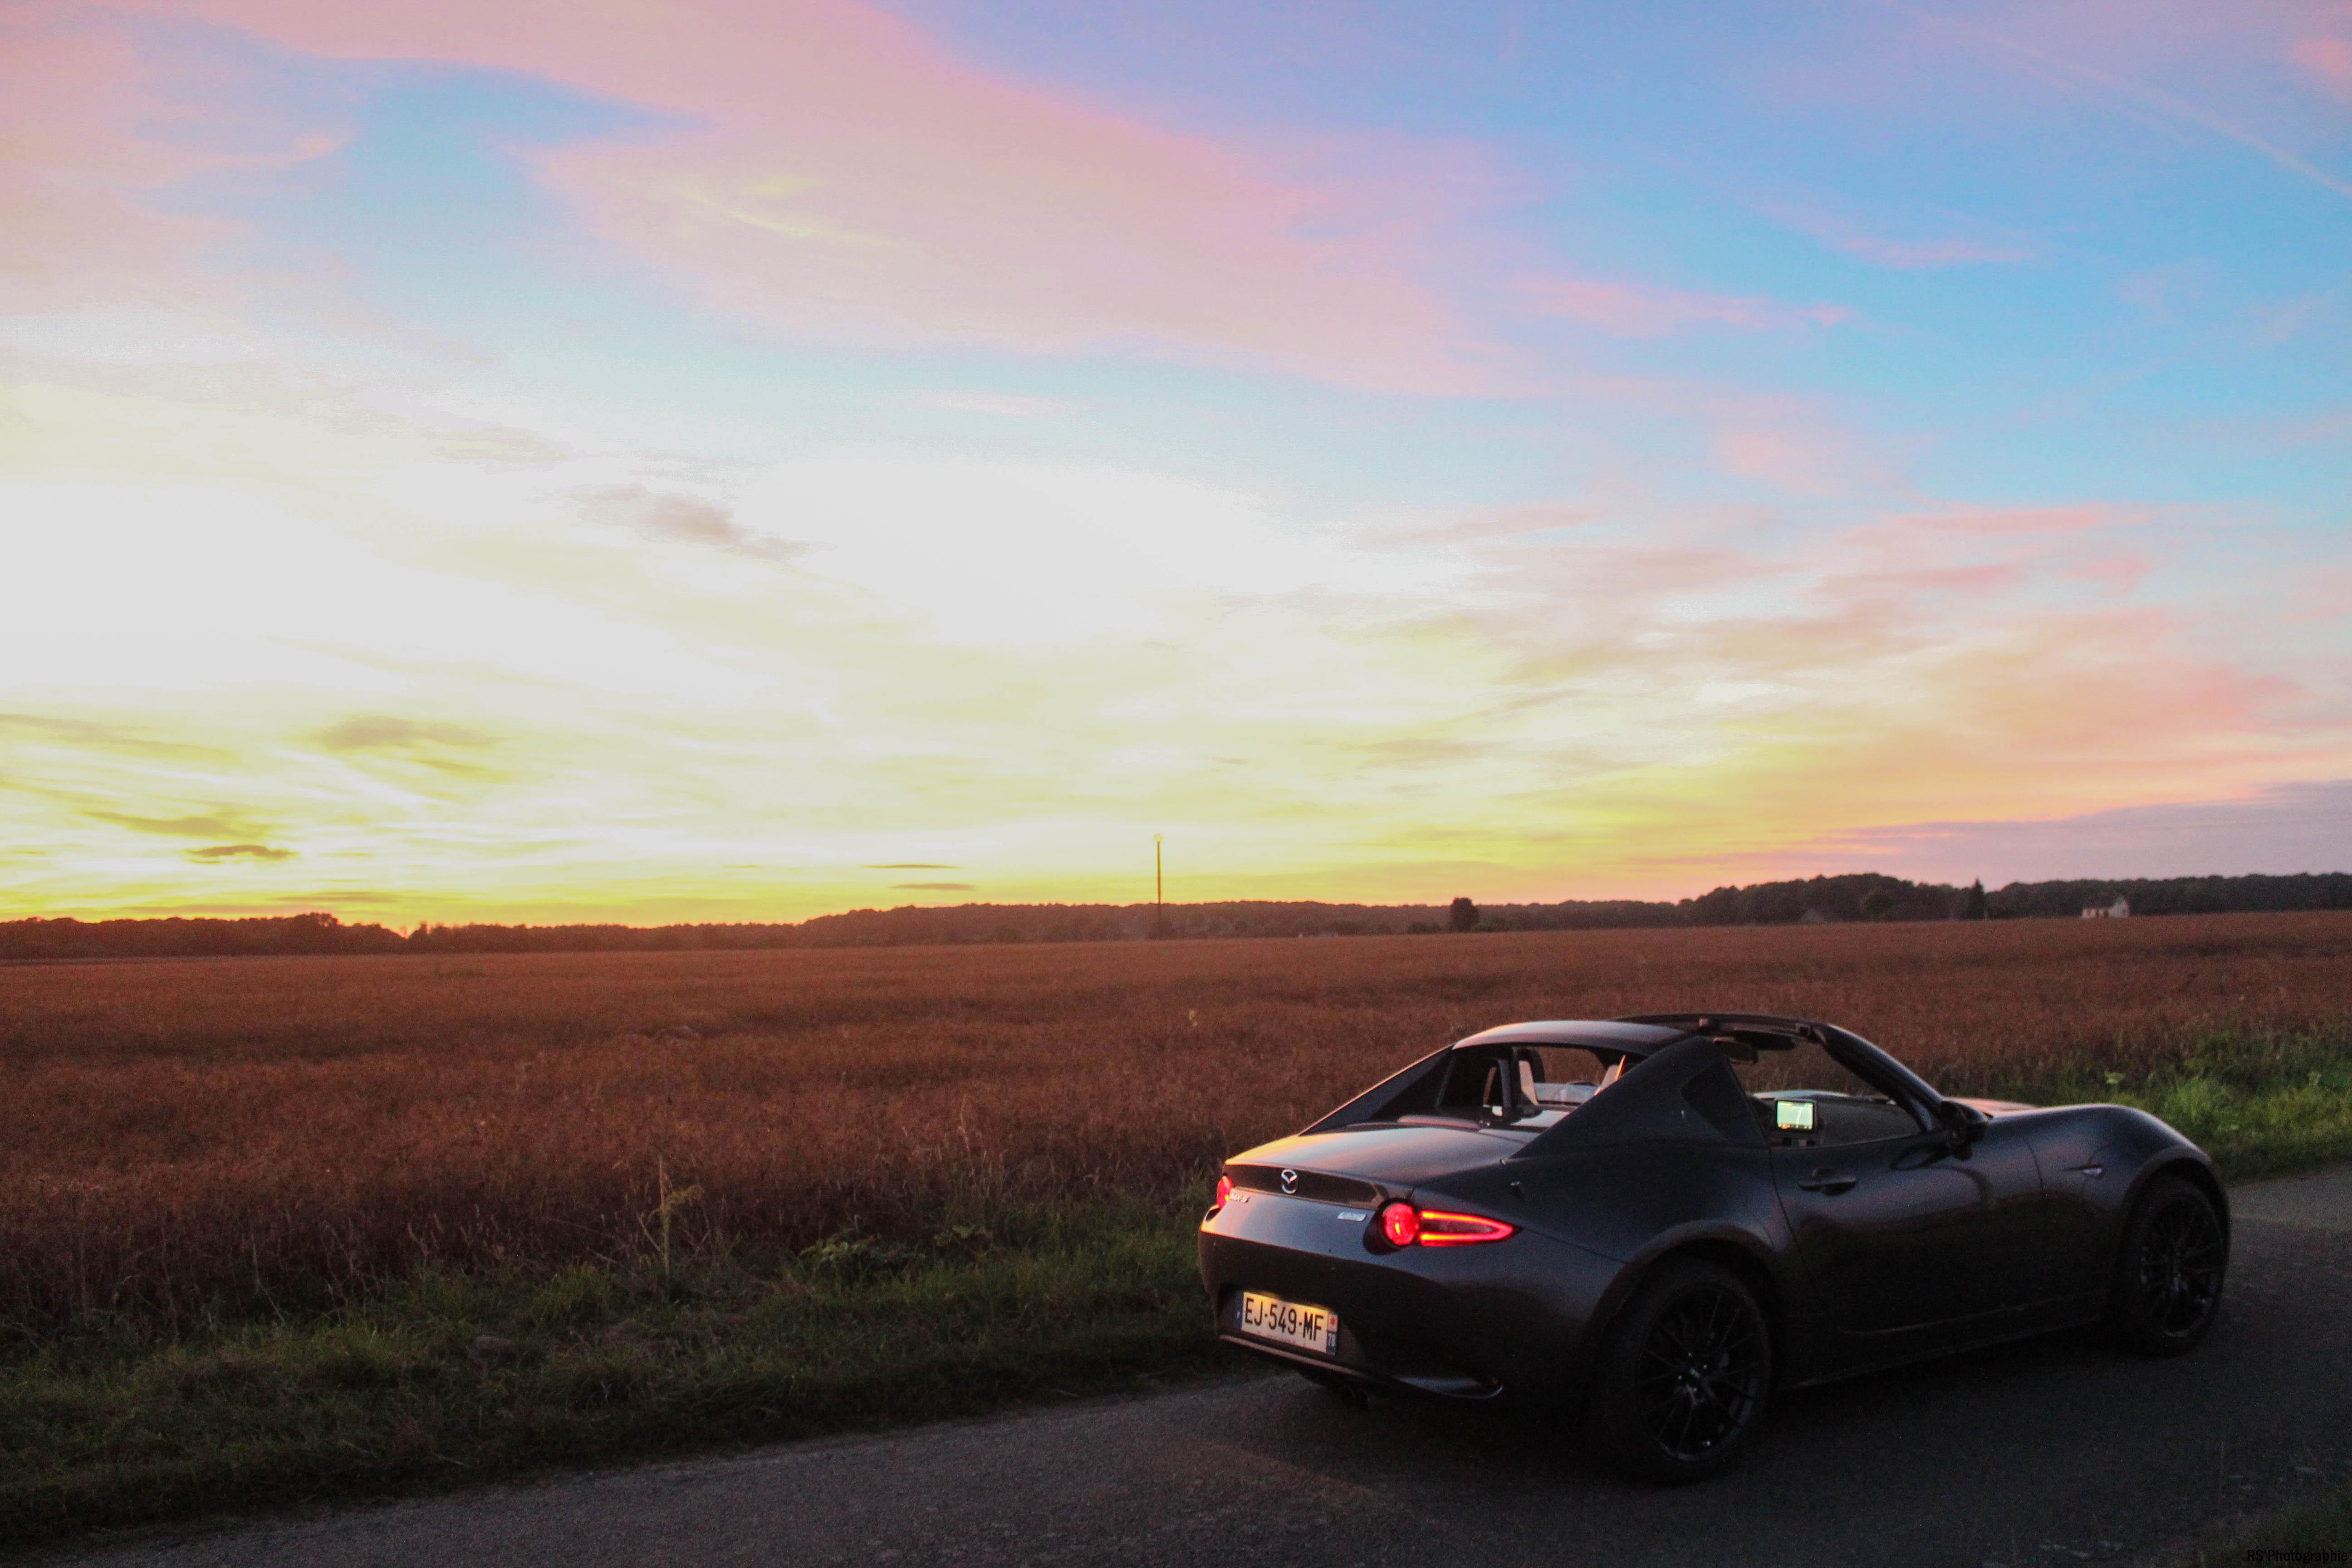 MazdaMX5RF20-mazda-mx5-rf-edition-arriere-rear-Arnaud Demasier-RSPhotographie